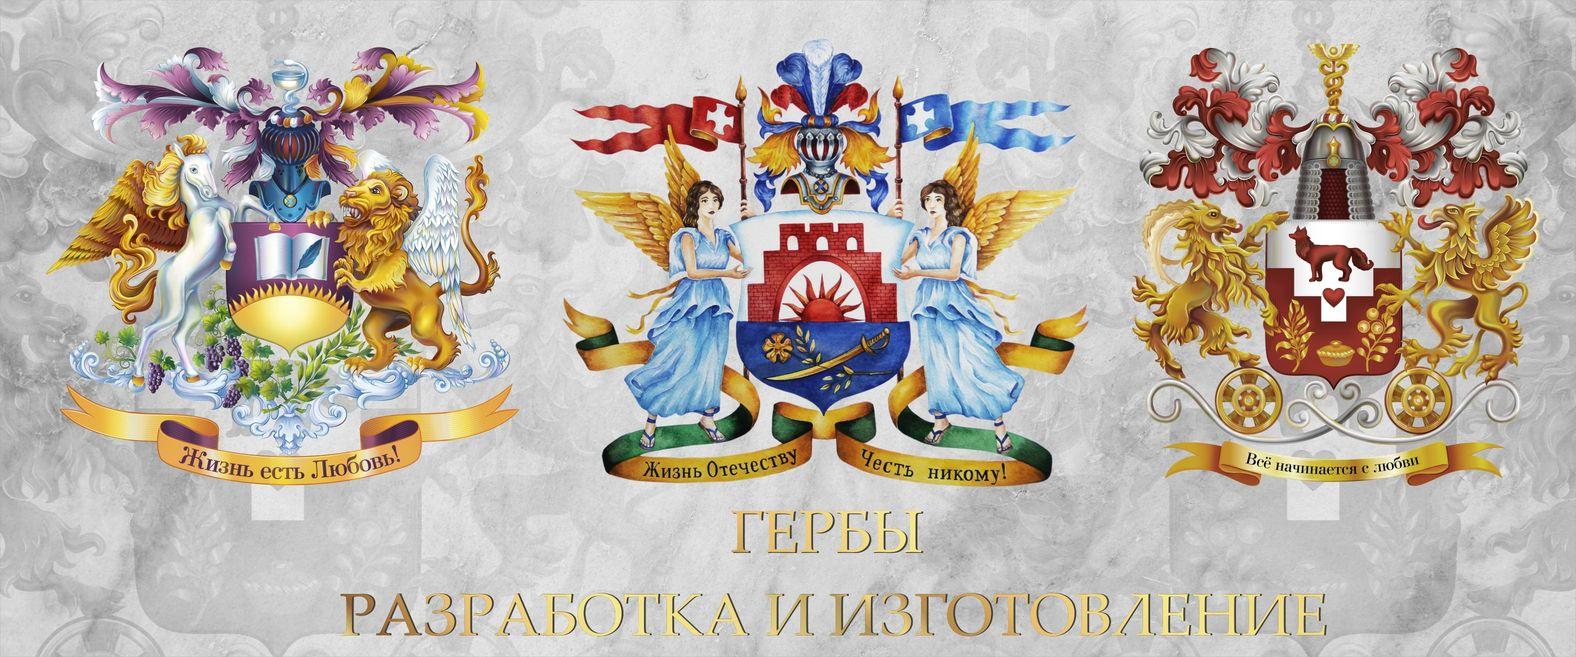 разработка и изготовление гербов на заказ